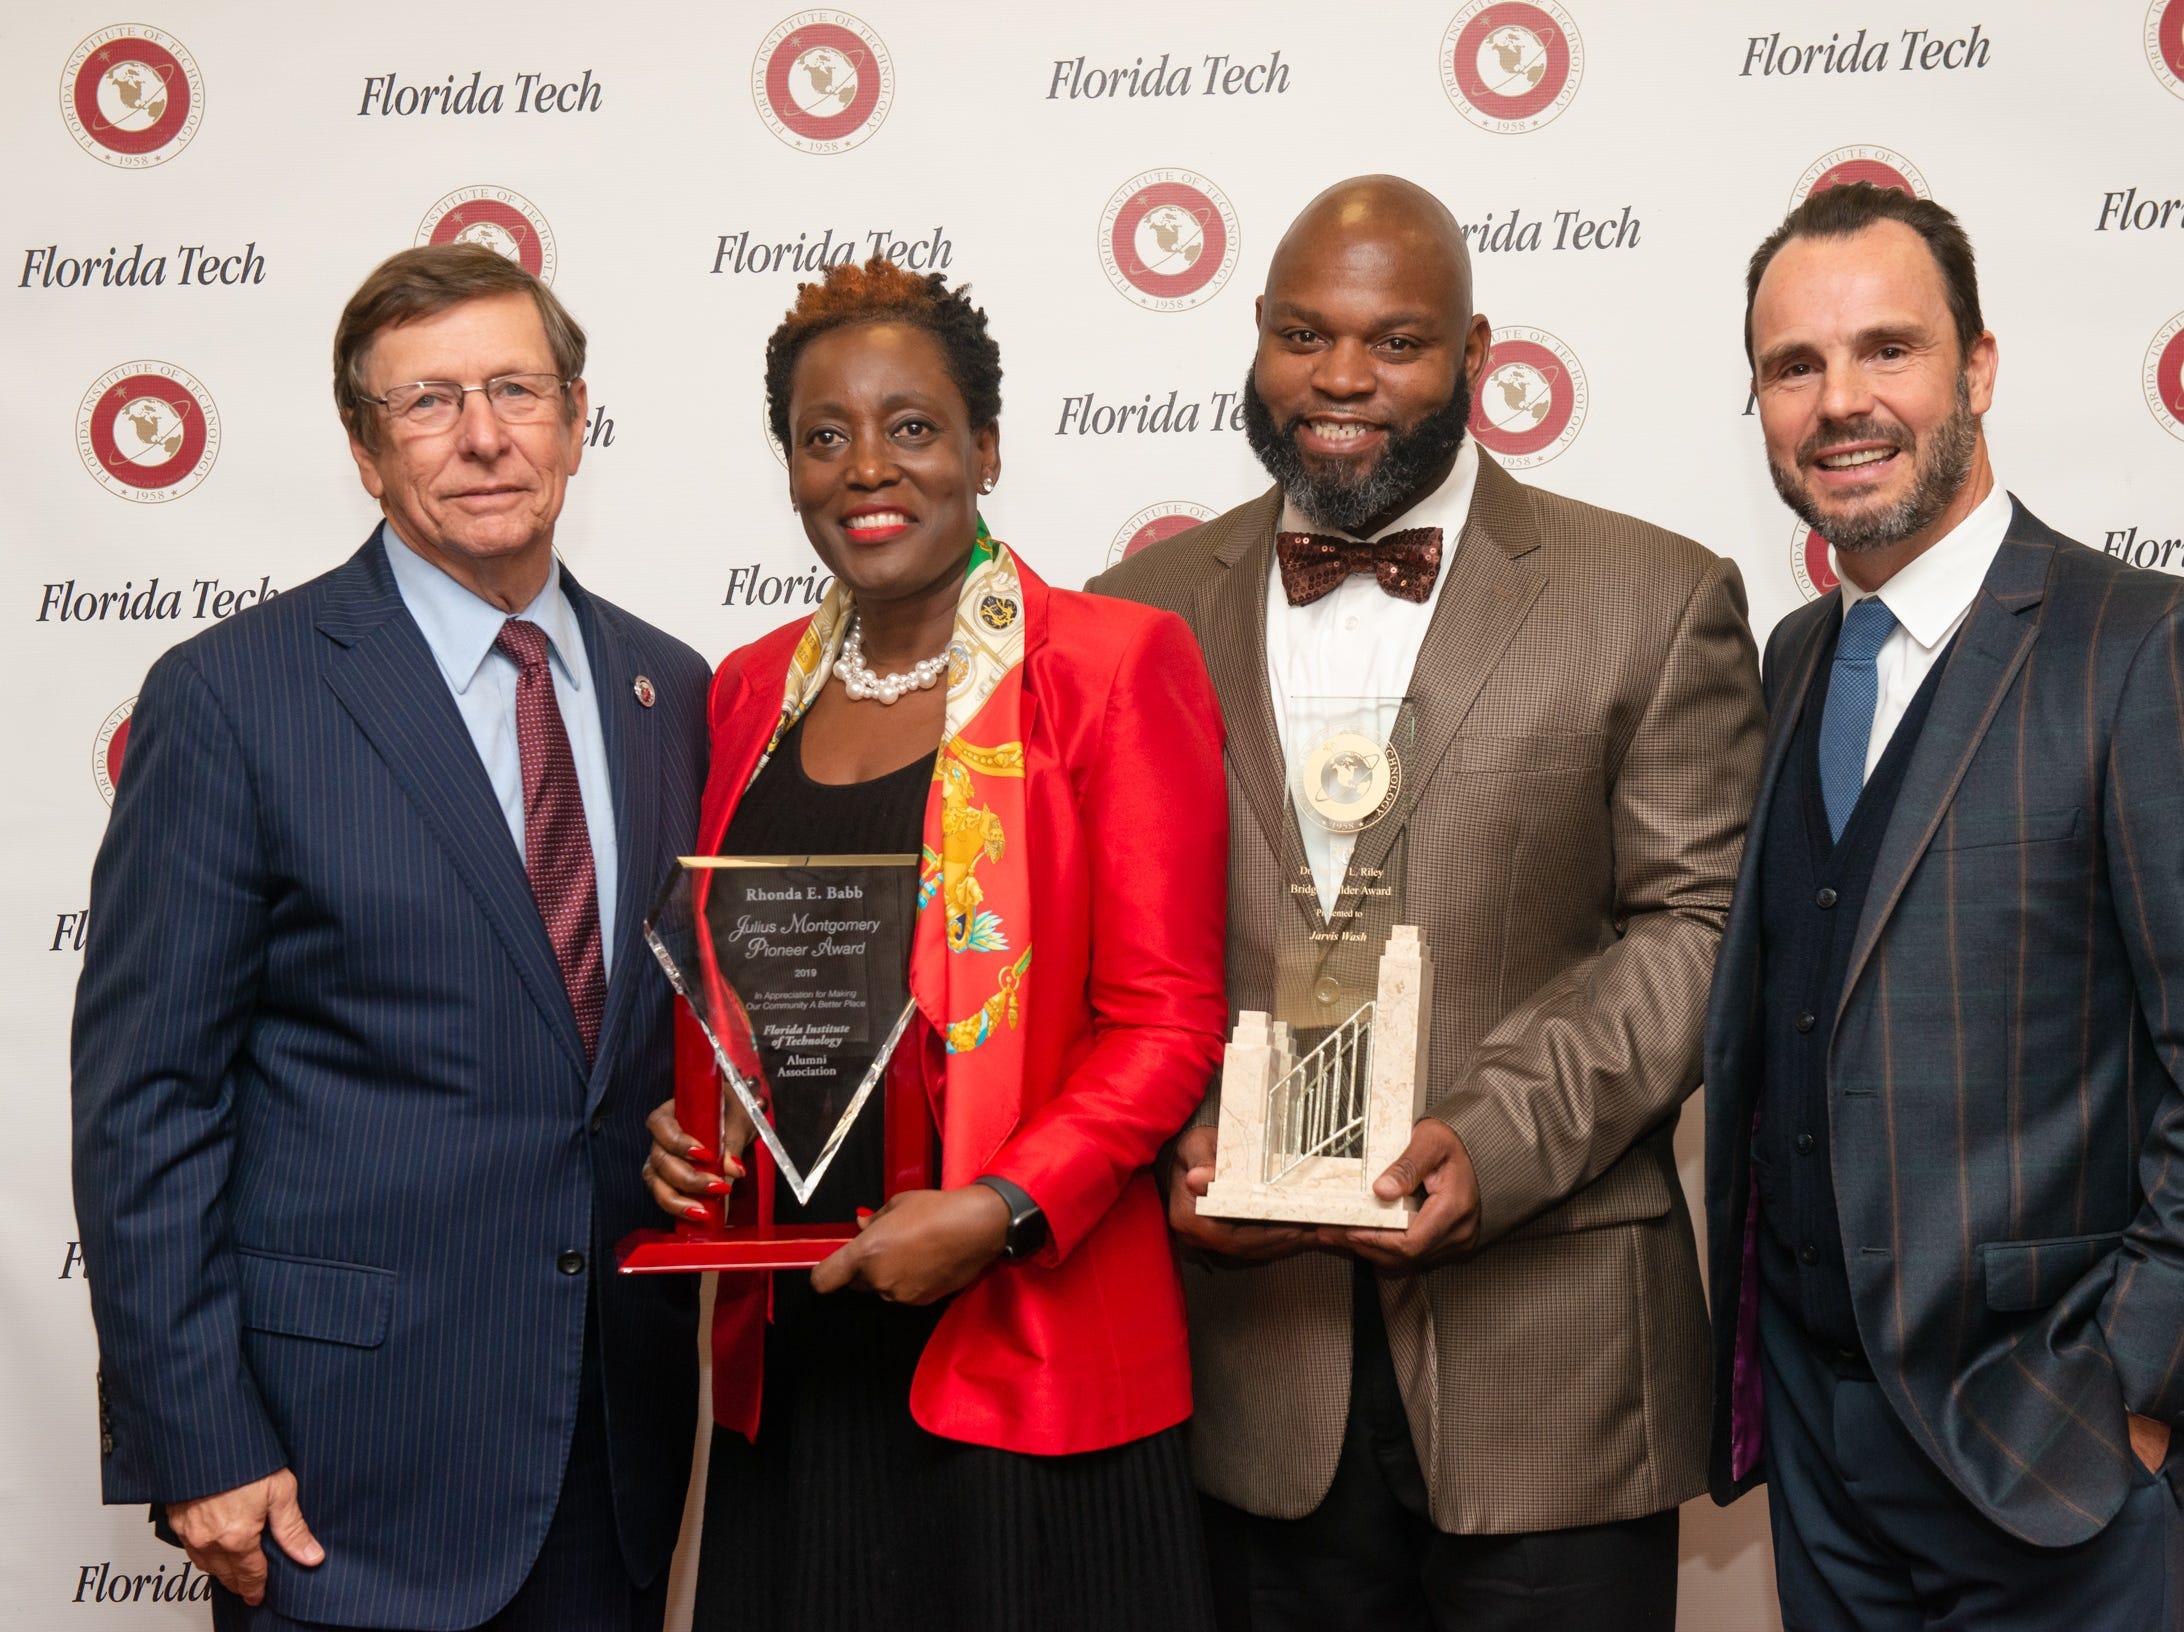 Julius Montgomery Pioneer award winner judge Rhonda E. Babb and Bridge Builder award winner Jarvis Wash.